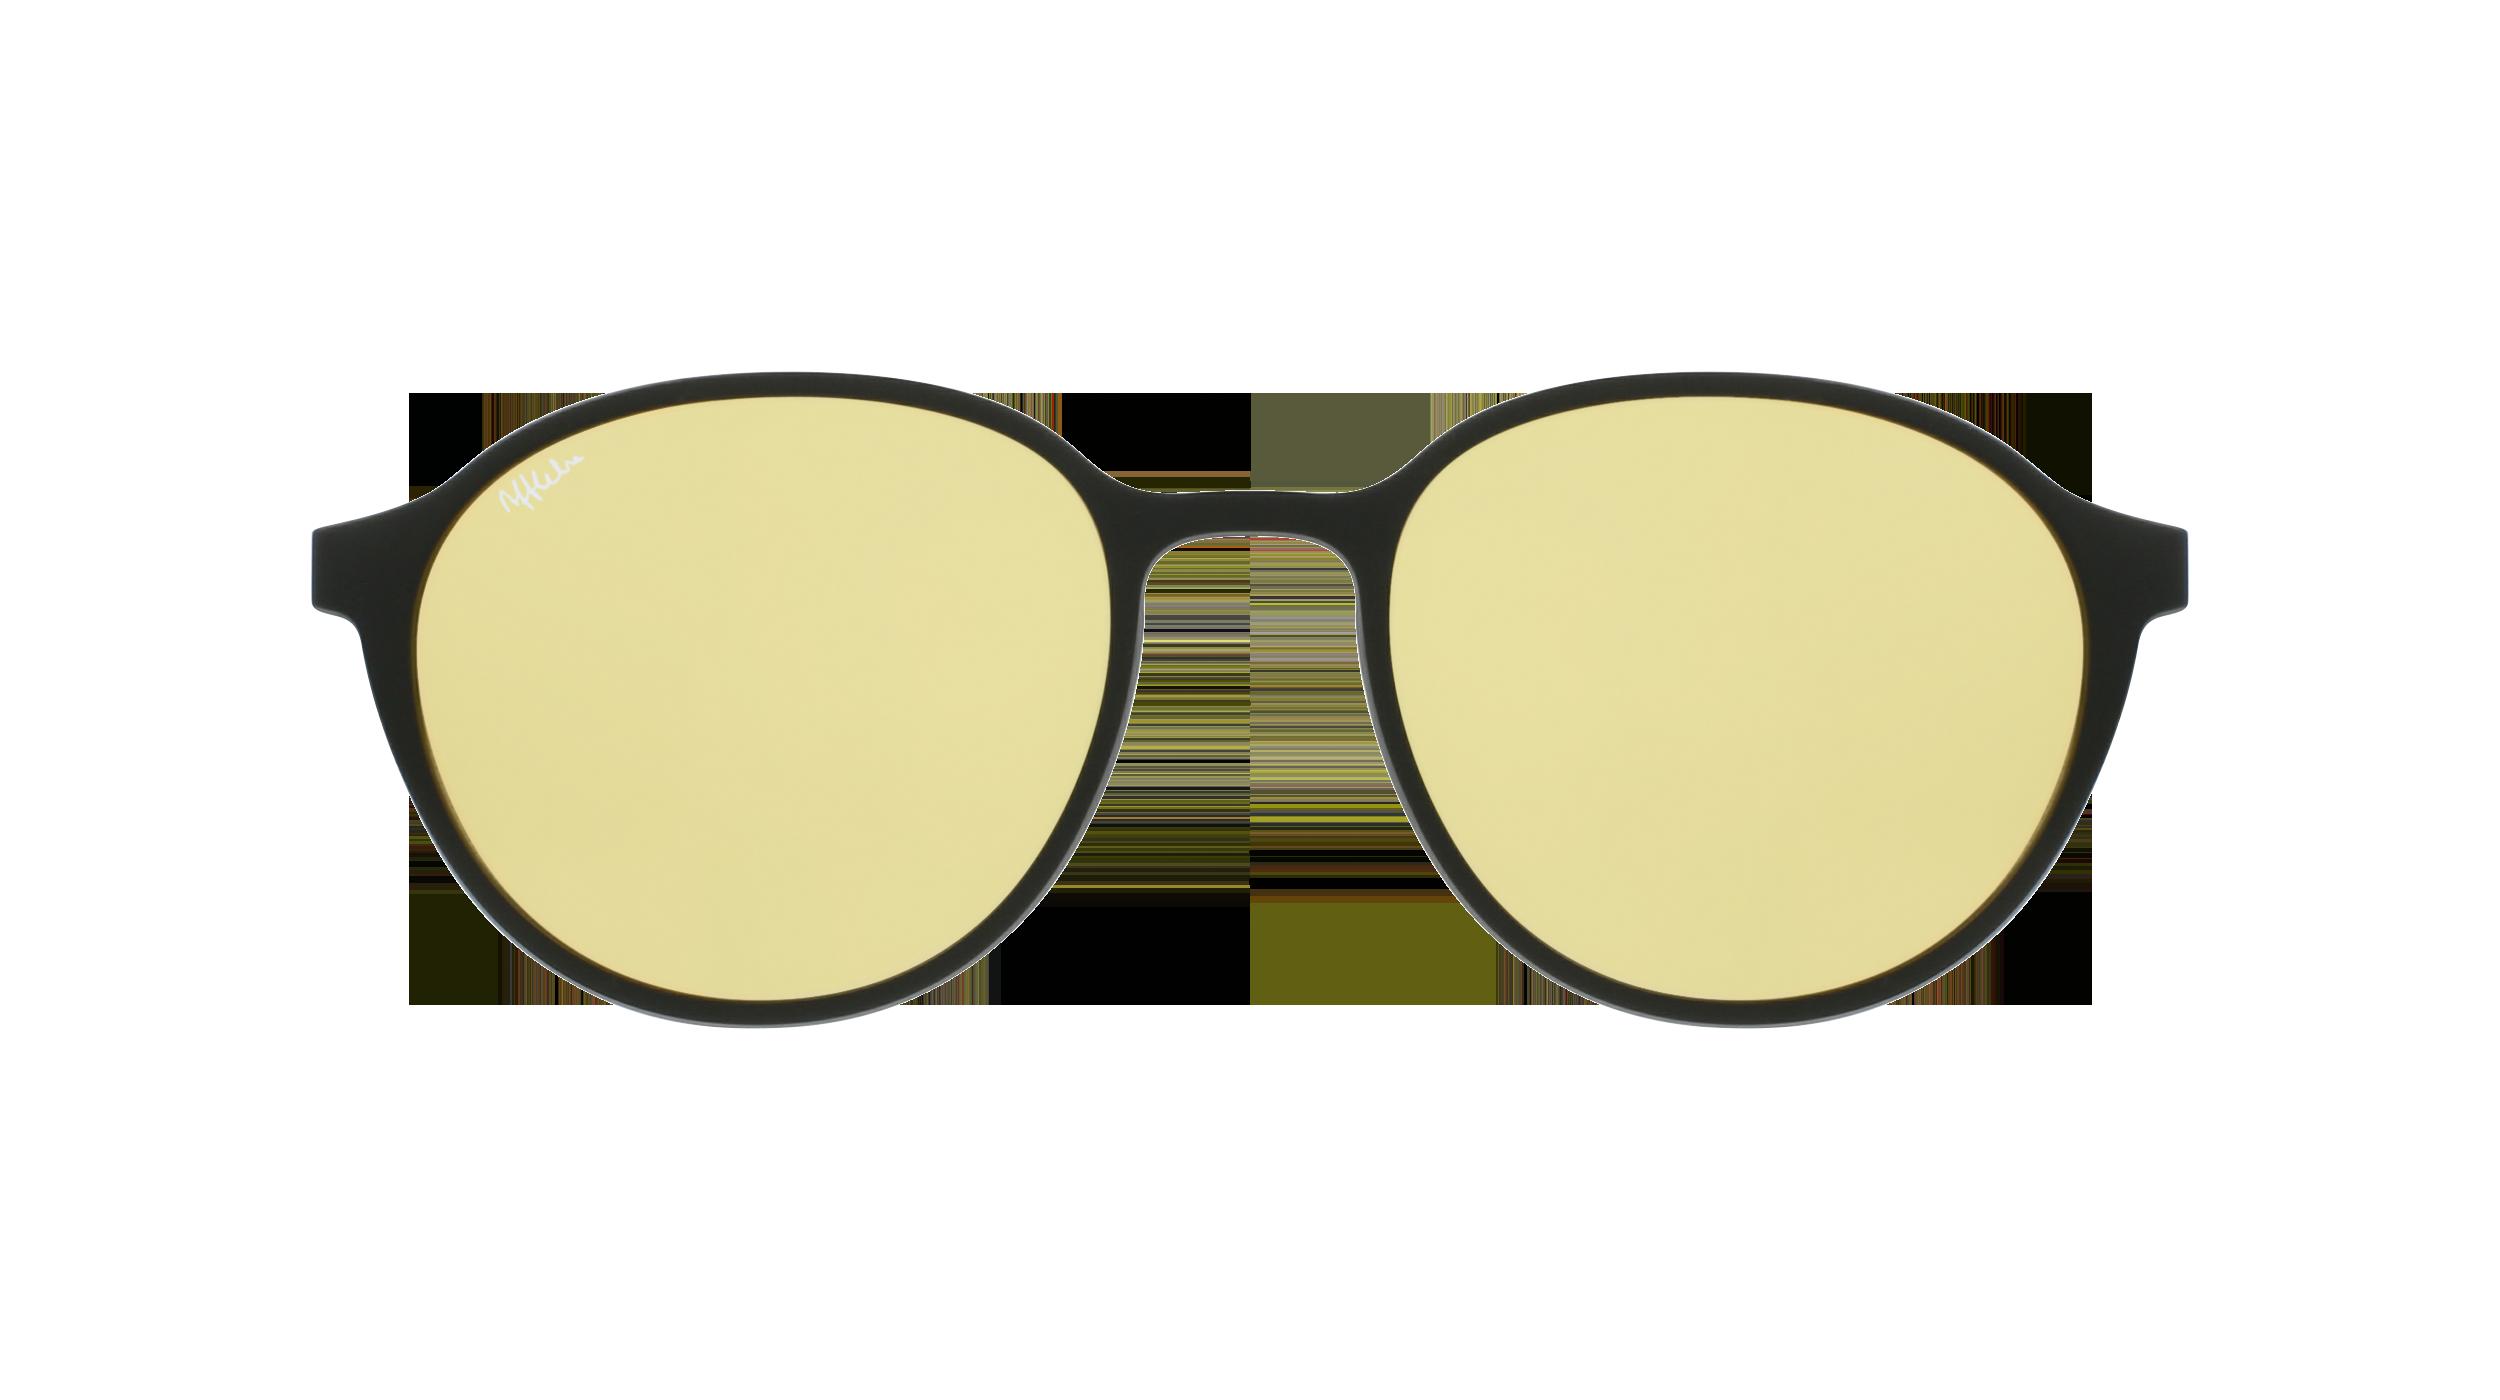 afflelou/france/products/smart_clip/clips_glasses/07630036458778.png